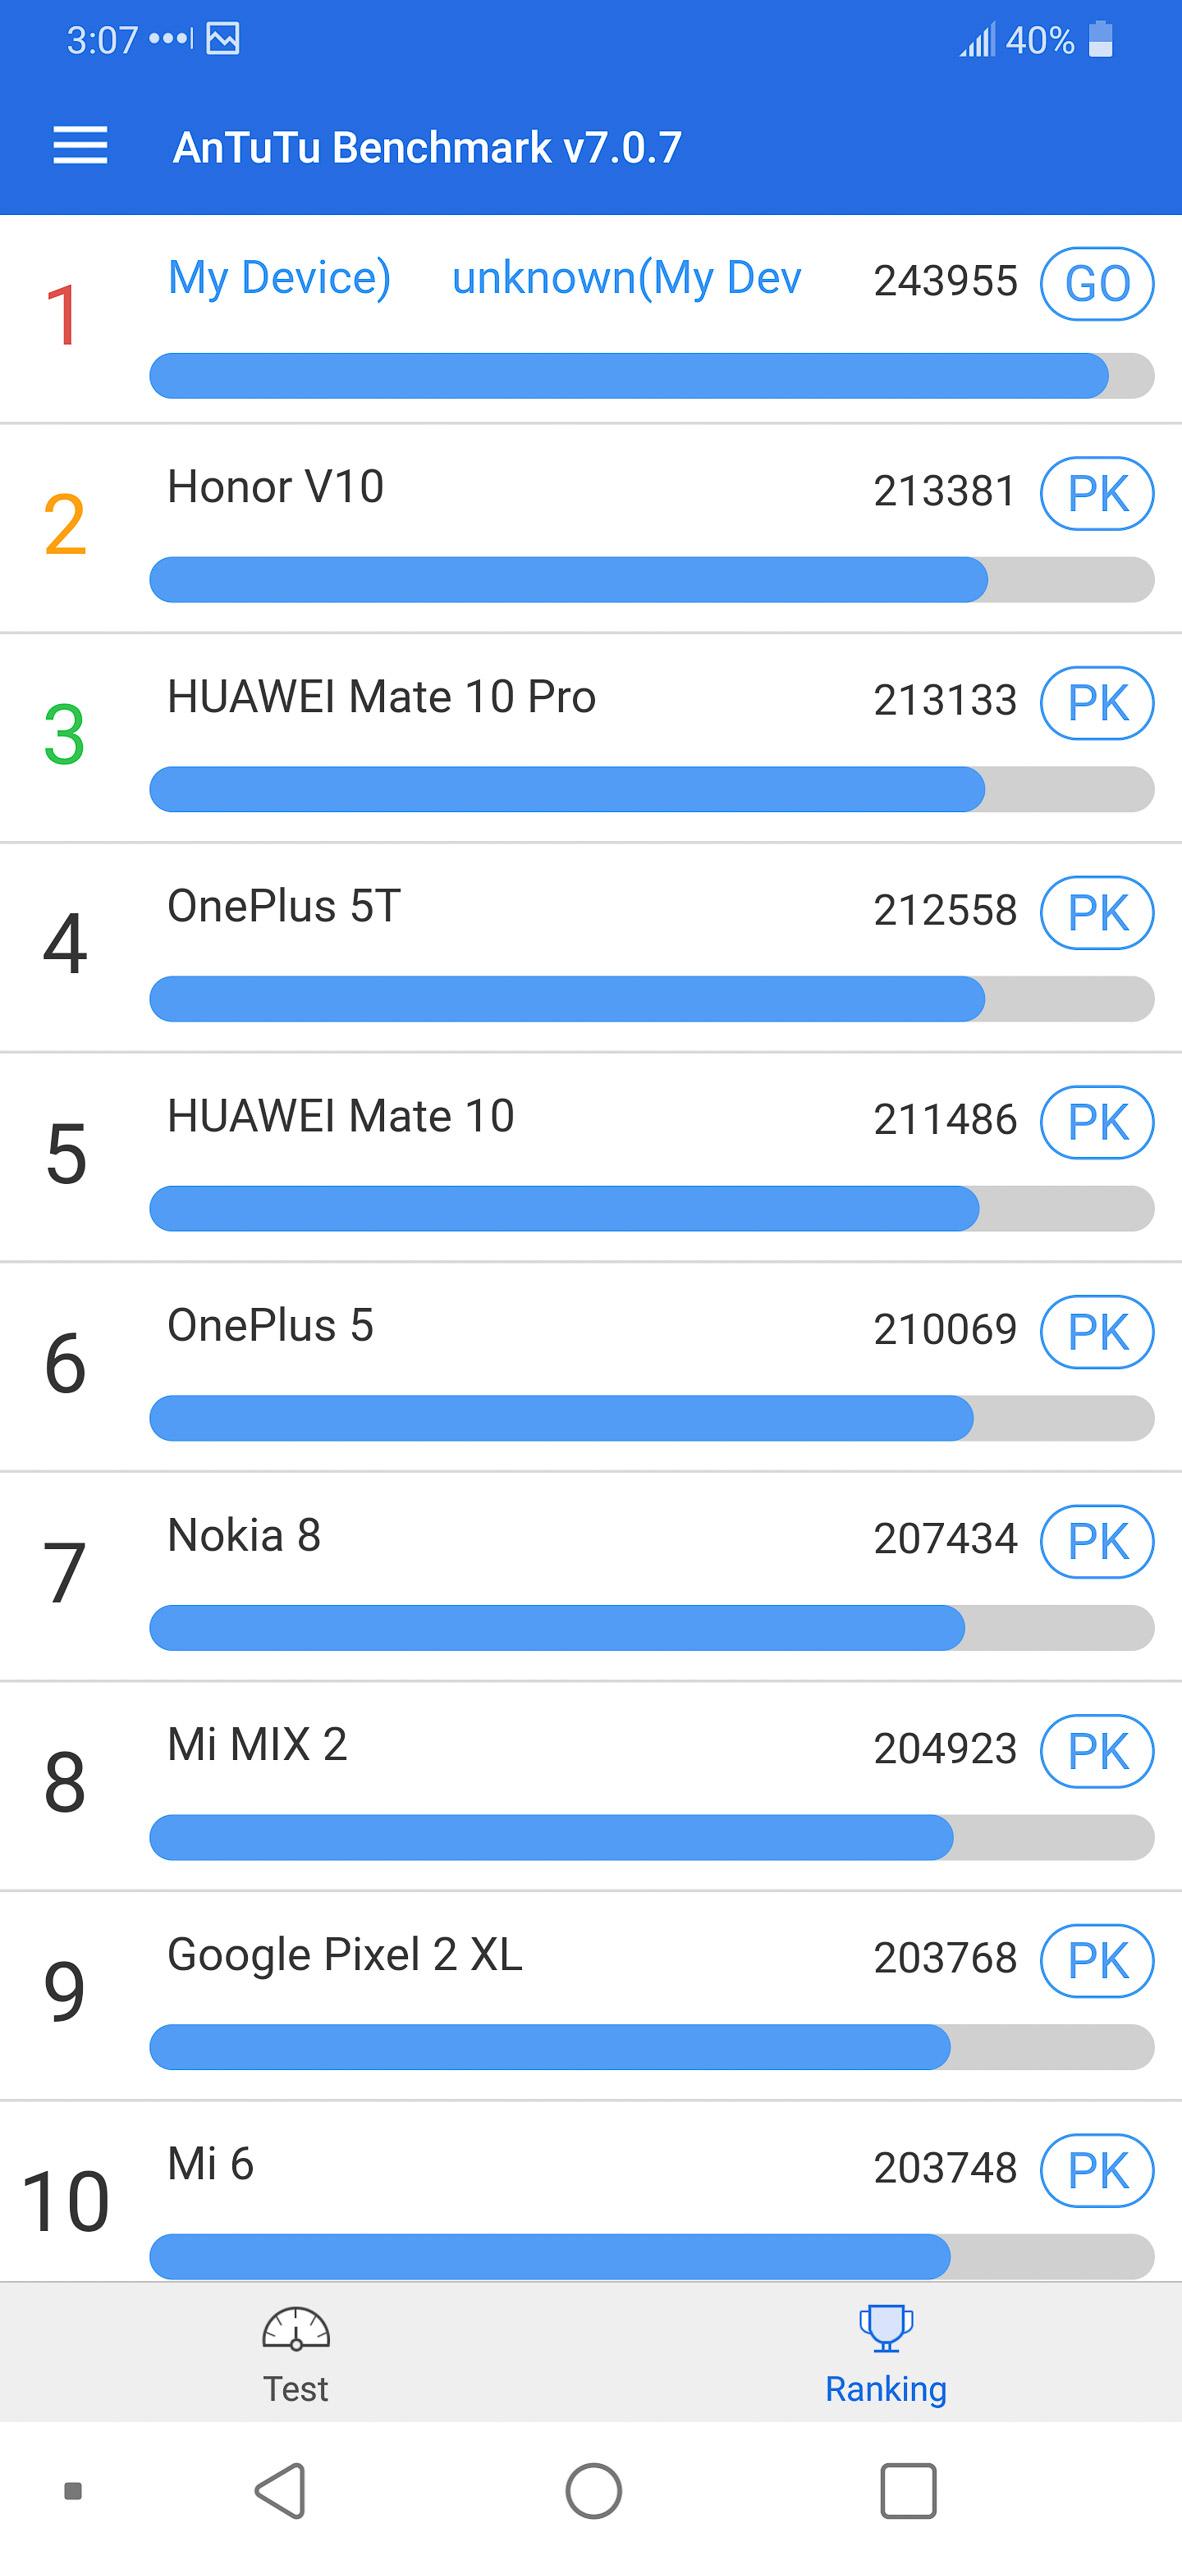 antutu LG 7 Thing benchmark performance test